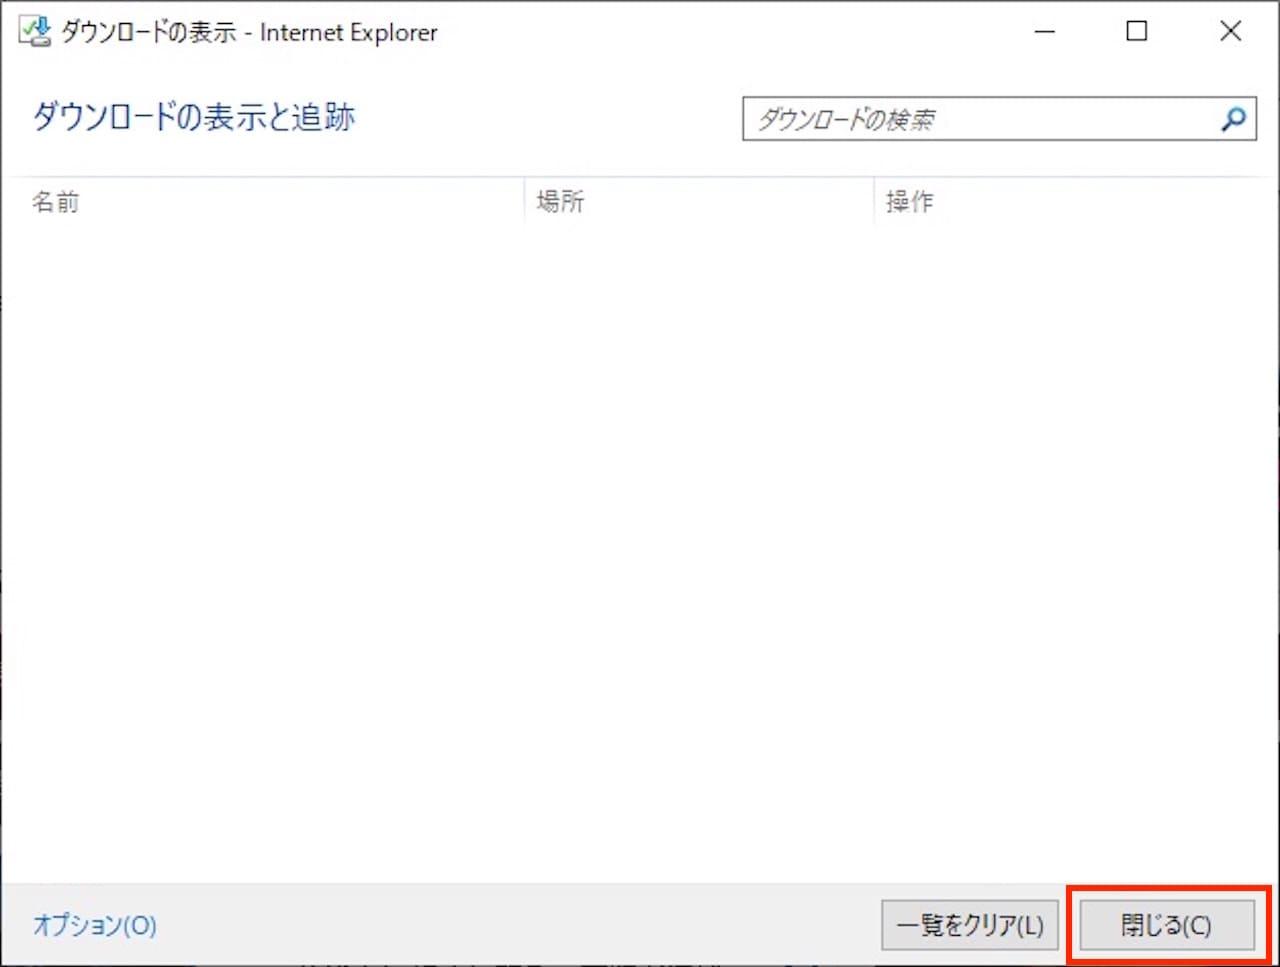 Windows10でInternetExplorerのダウンロードファイルの保存先を変更する方法⑧